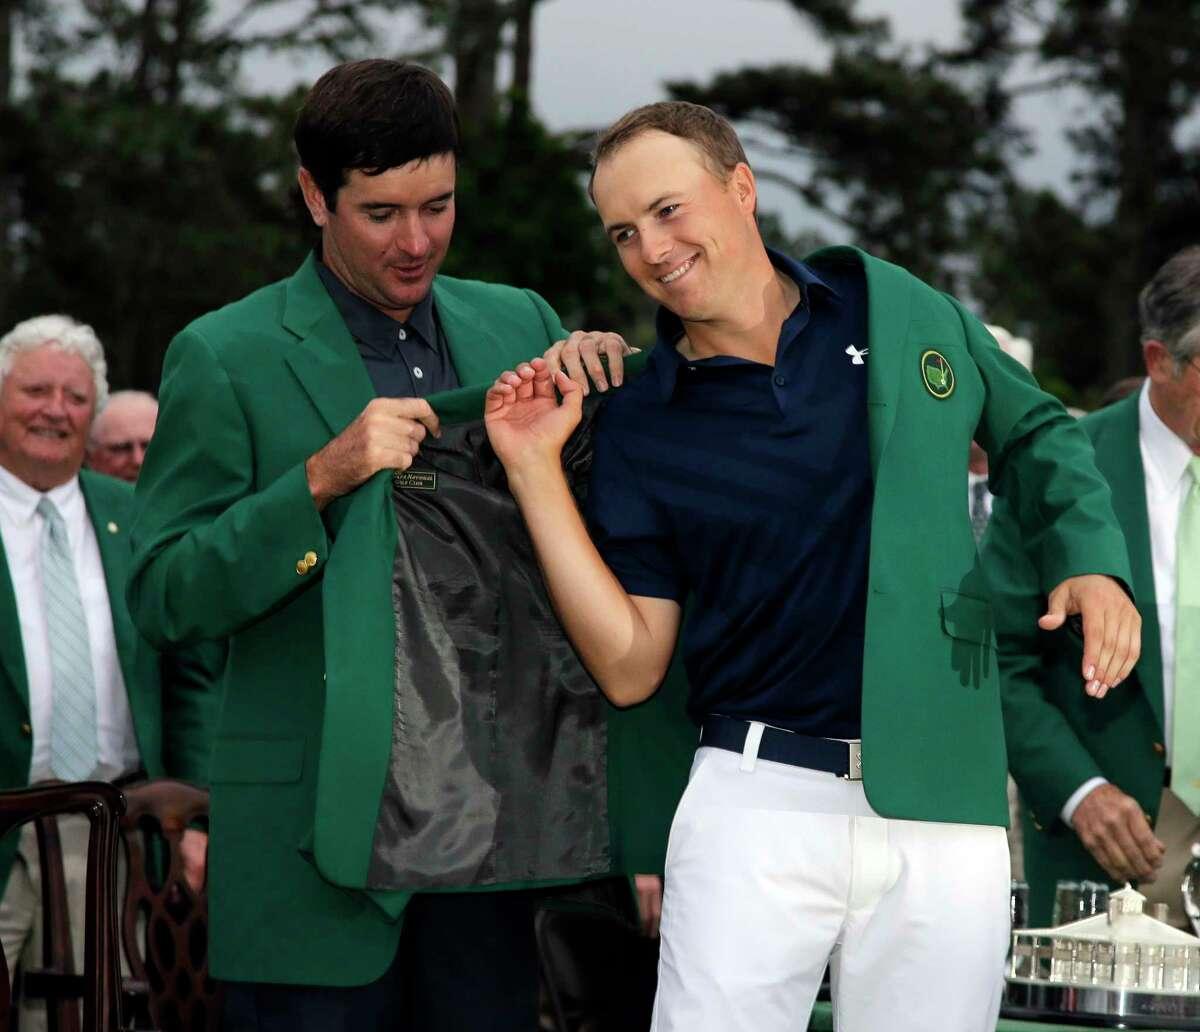 Bubba Watson helps Jordan Spieth put on his green jacket after Spieth won the Masters Sunday in Augusta, Ga.